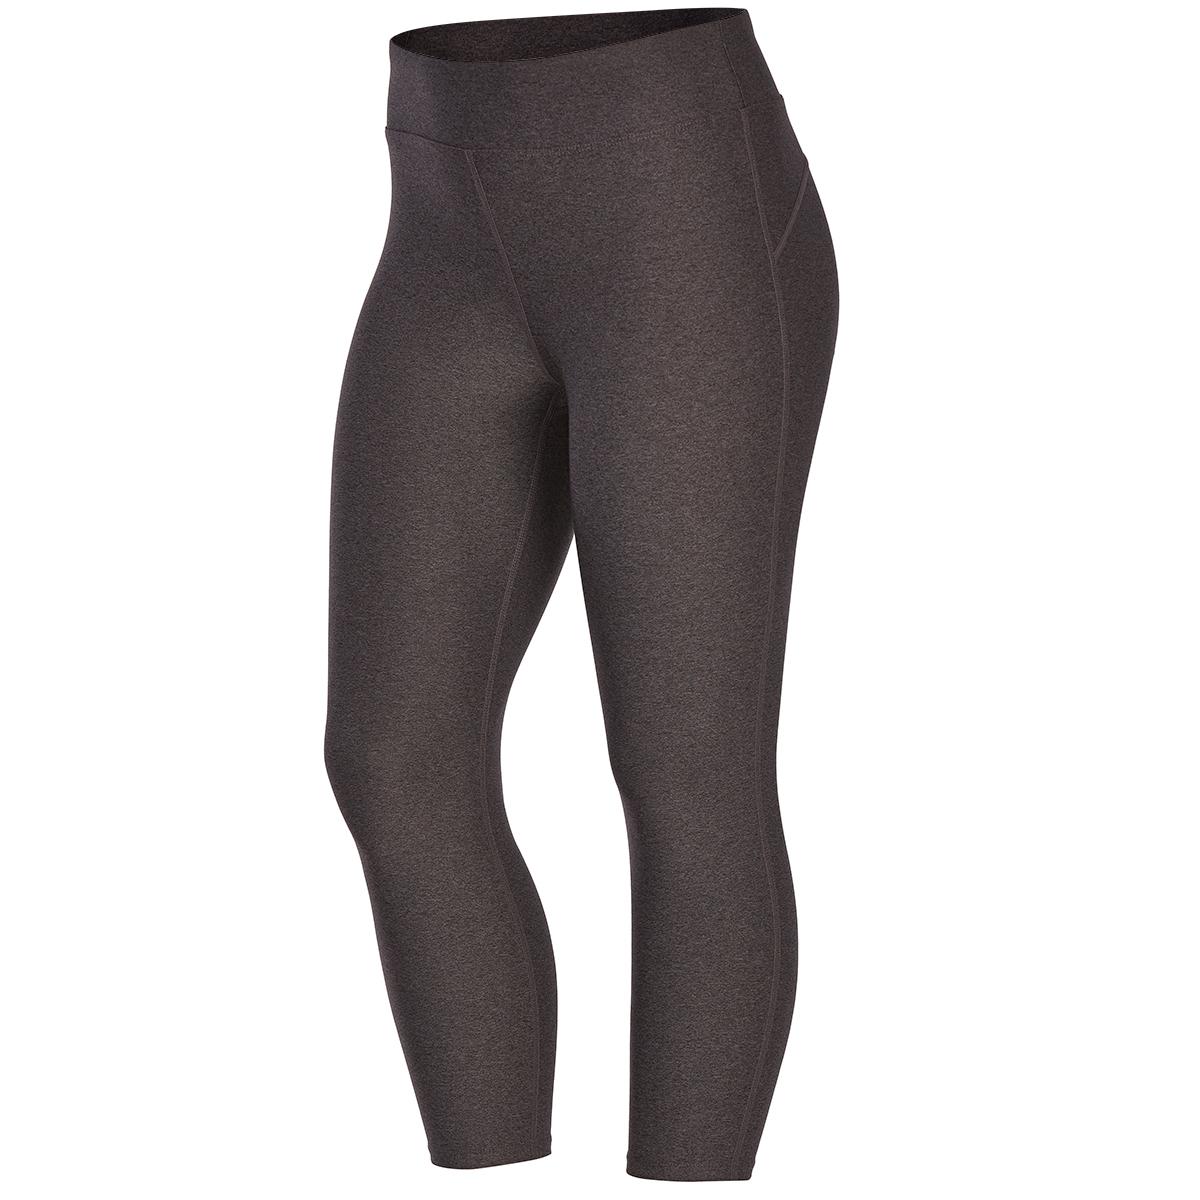 Ems Women's Techwick Fusion Capri Leggings - Black, M